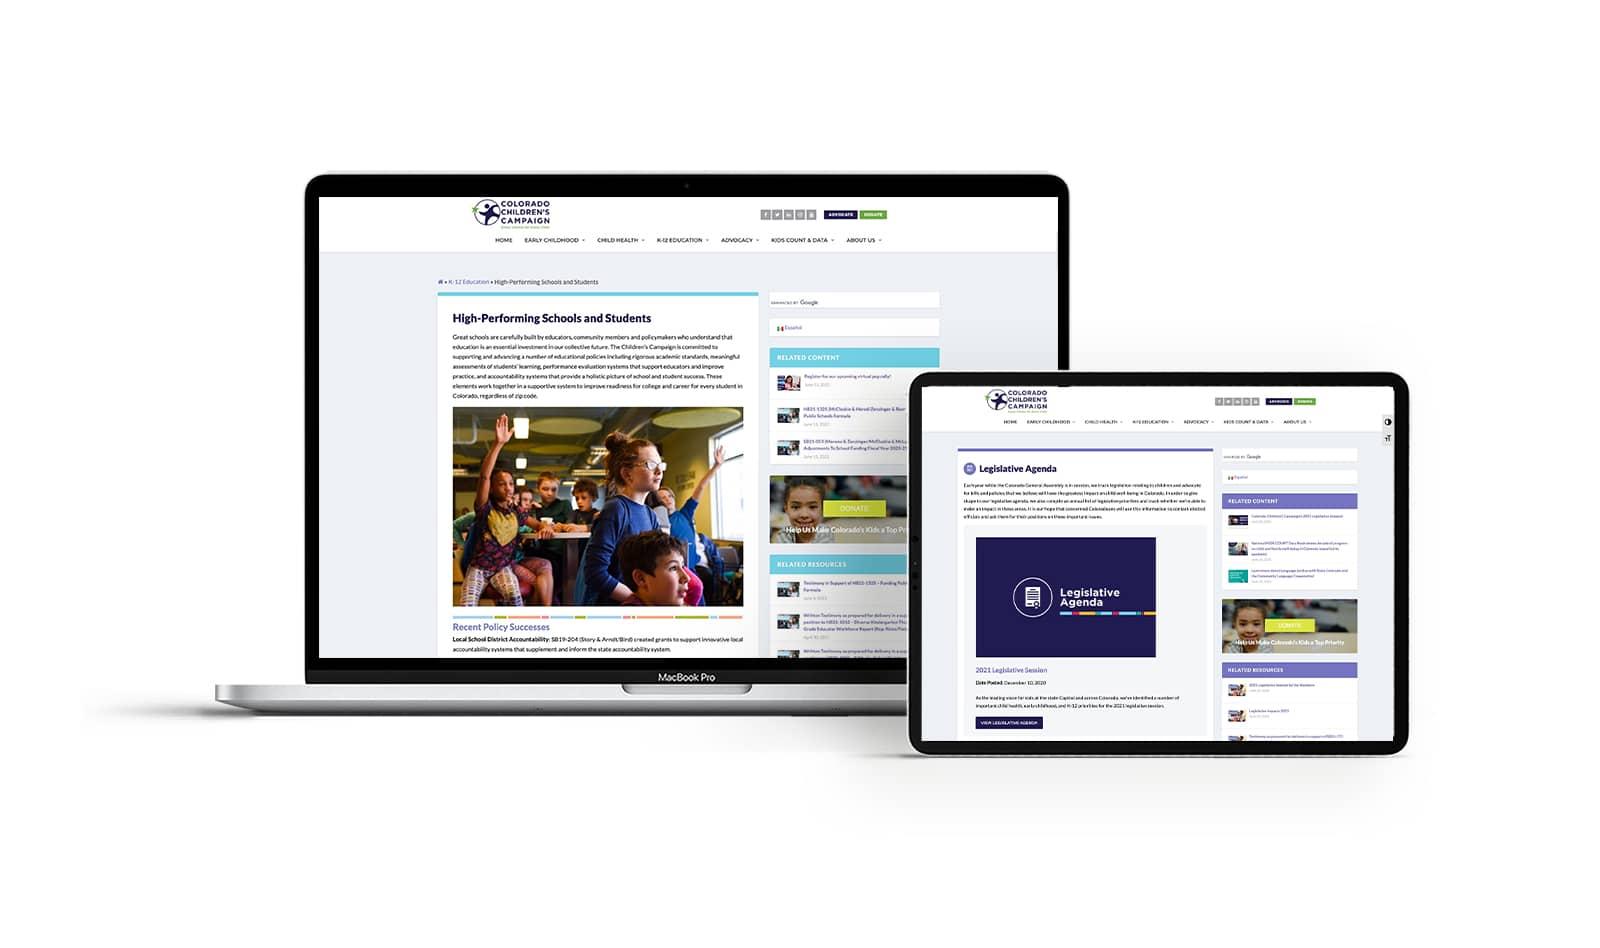 Colorado-Childrens-Campaign-Portfolio-on-devices